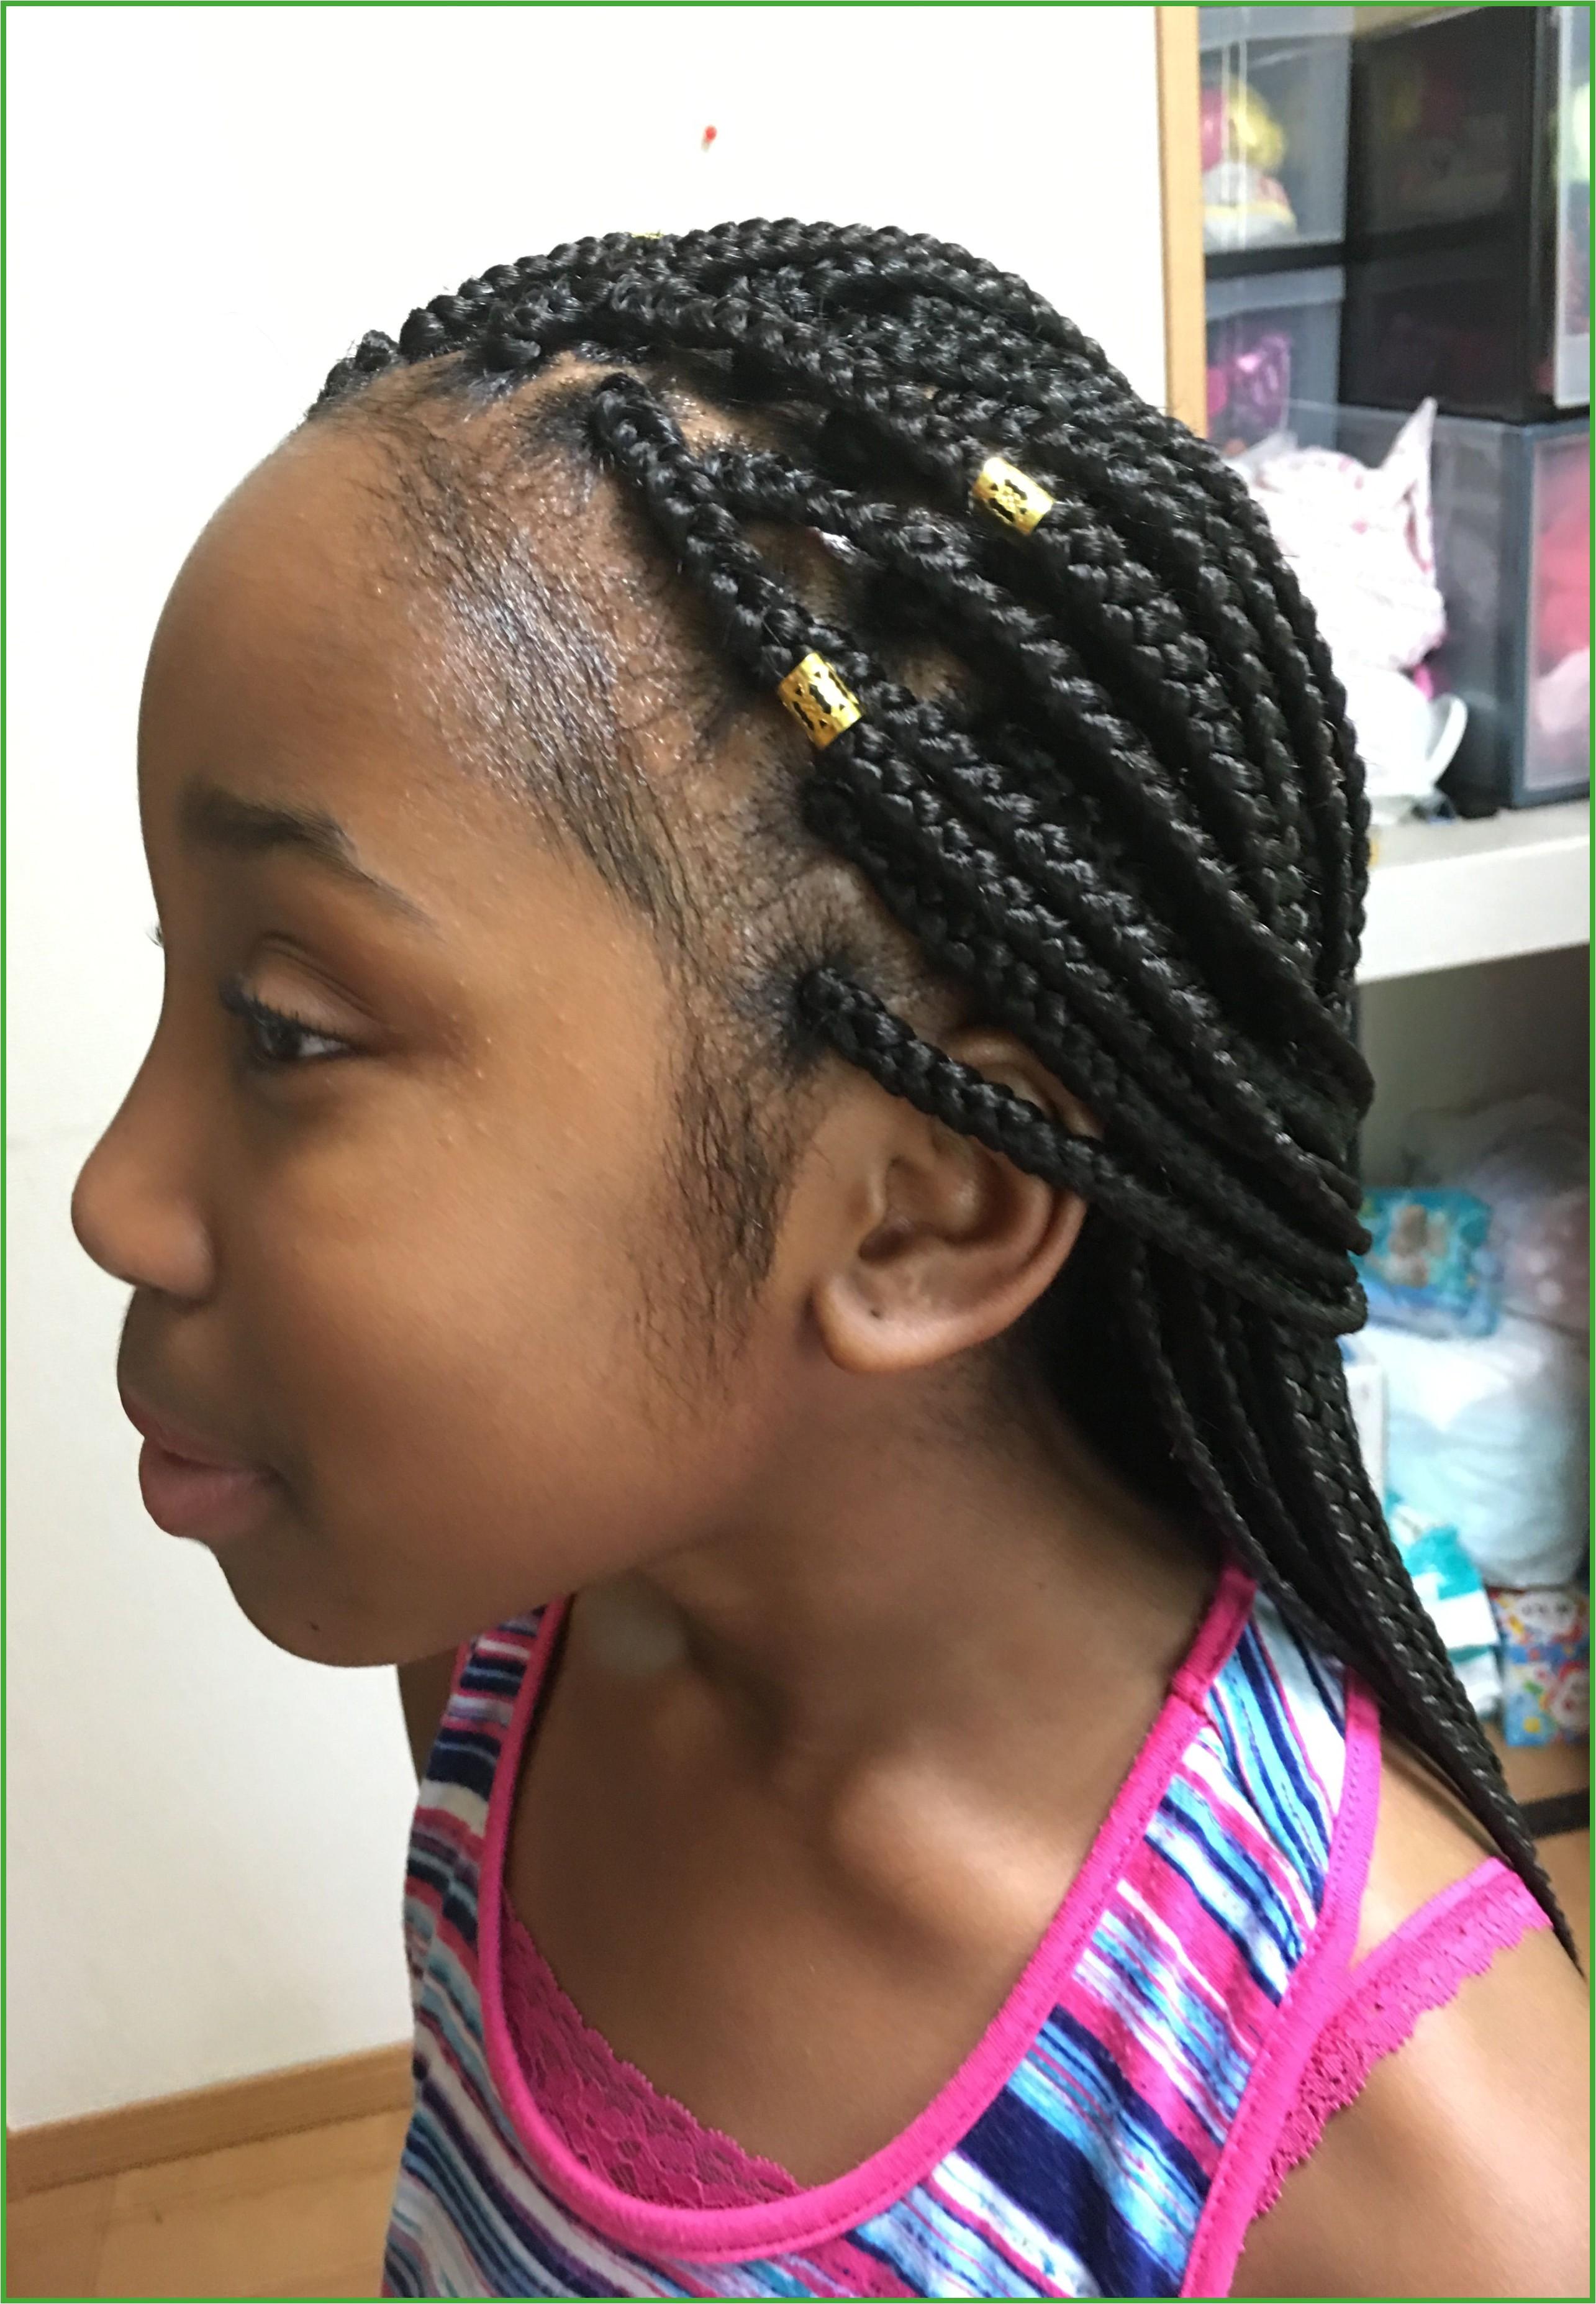 Cornrows Braids Braid Hairstyles Cornrow French Braids Twists Hair Weaves Knit Stitches